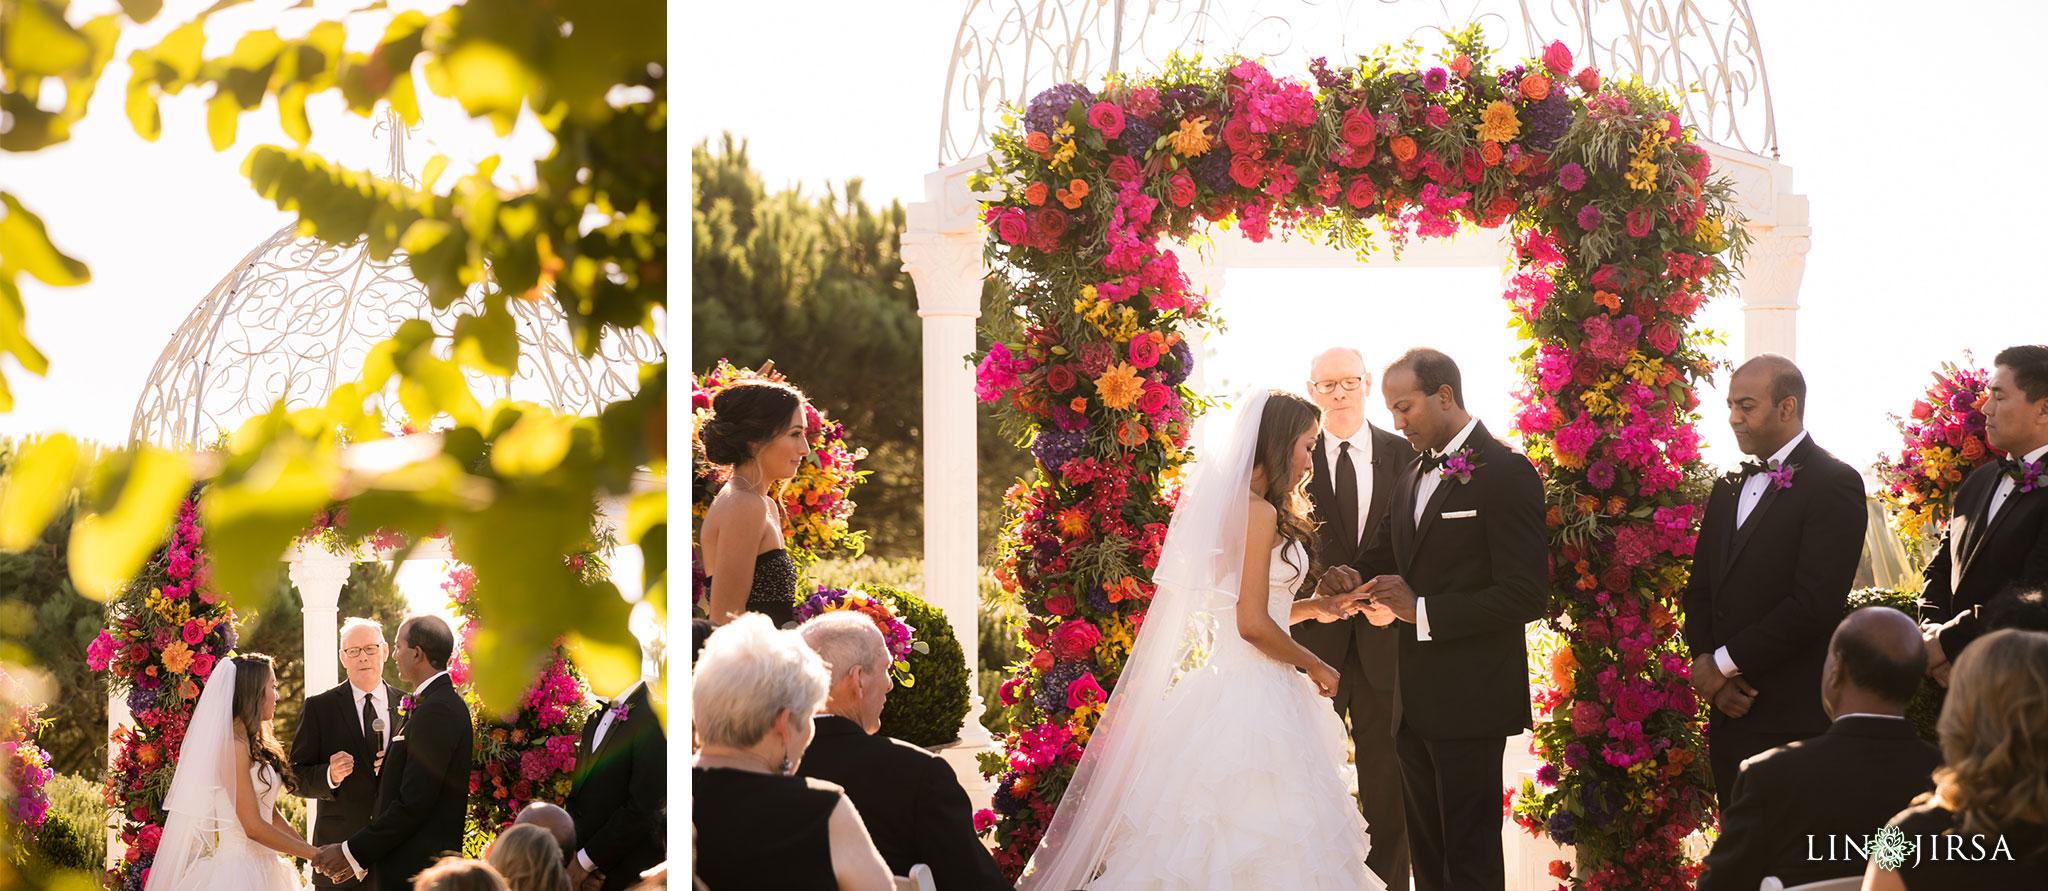 21 monarch beach resort wedding ceremony photography